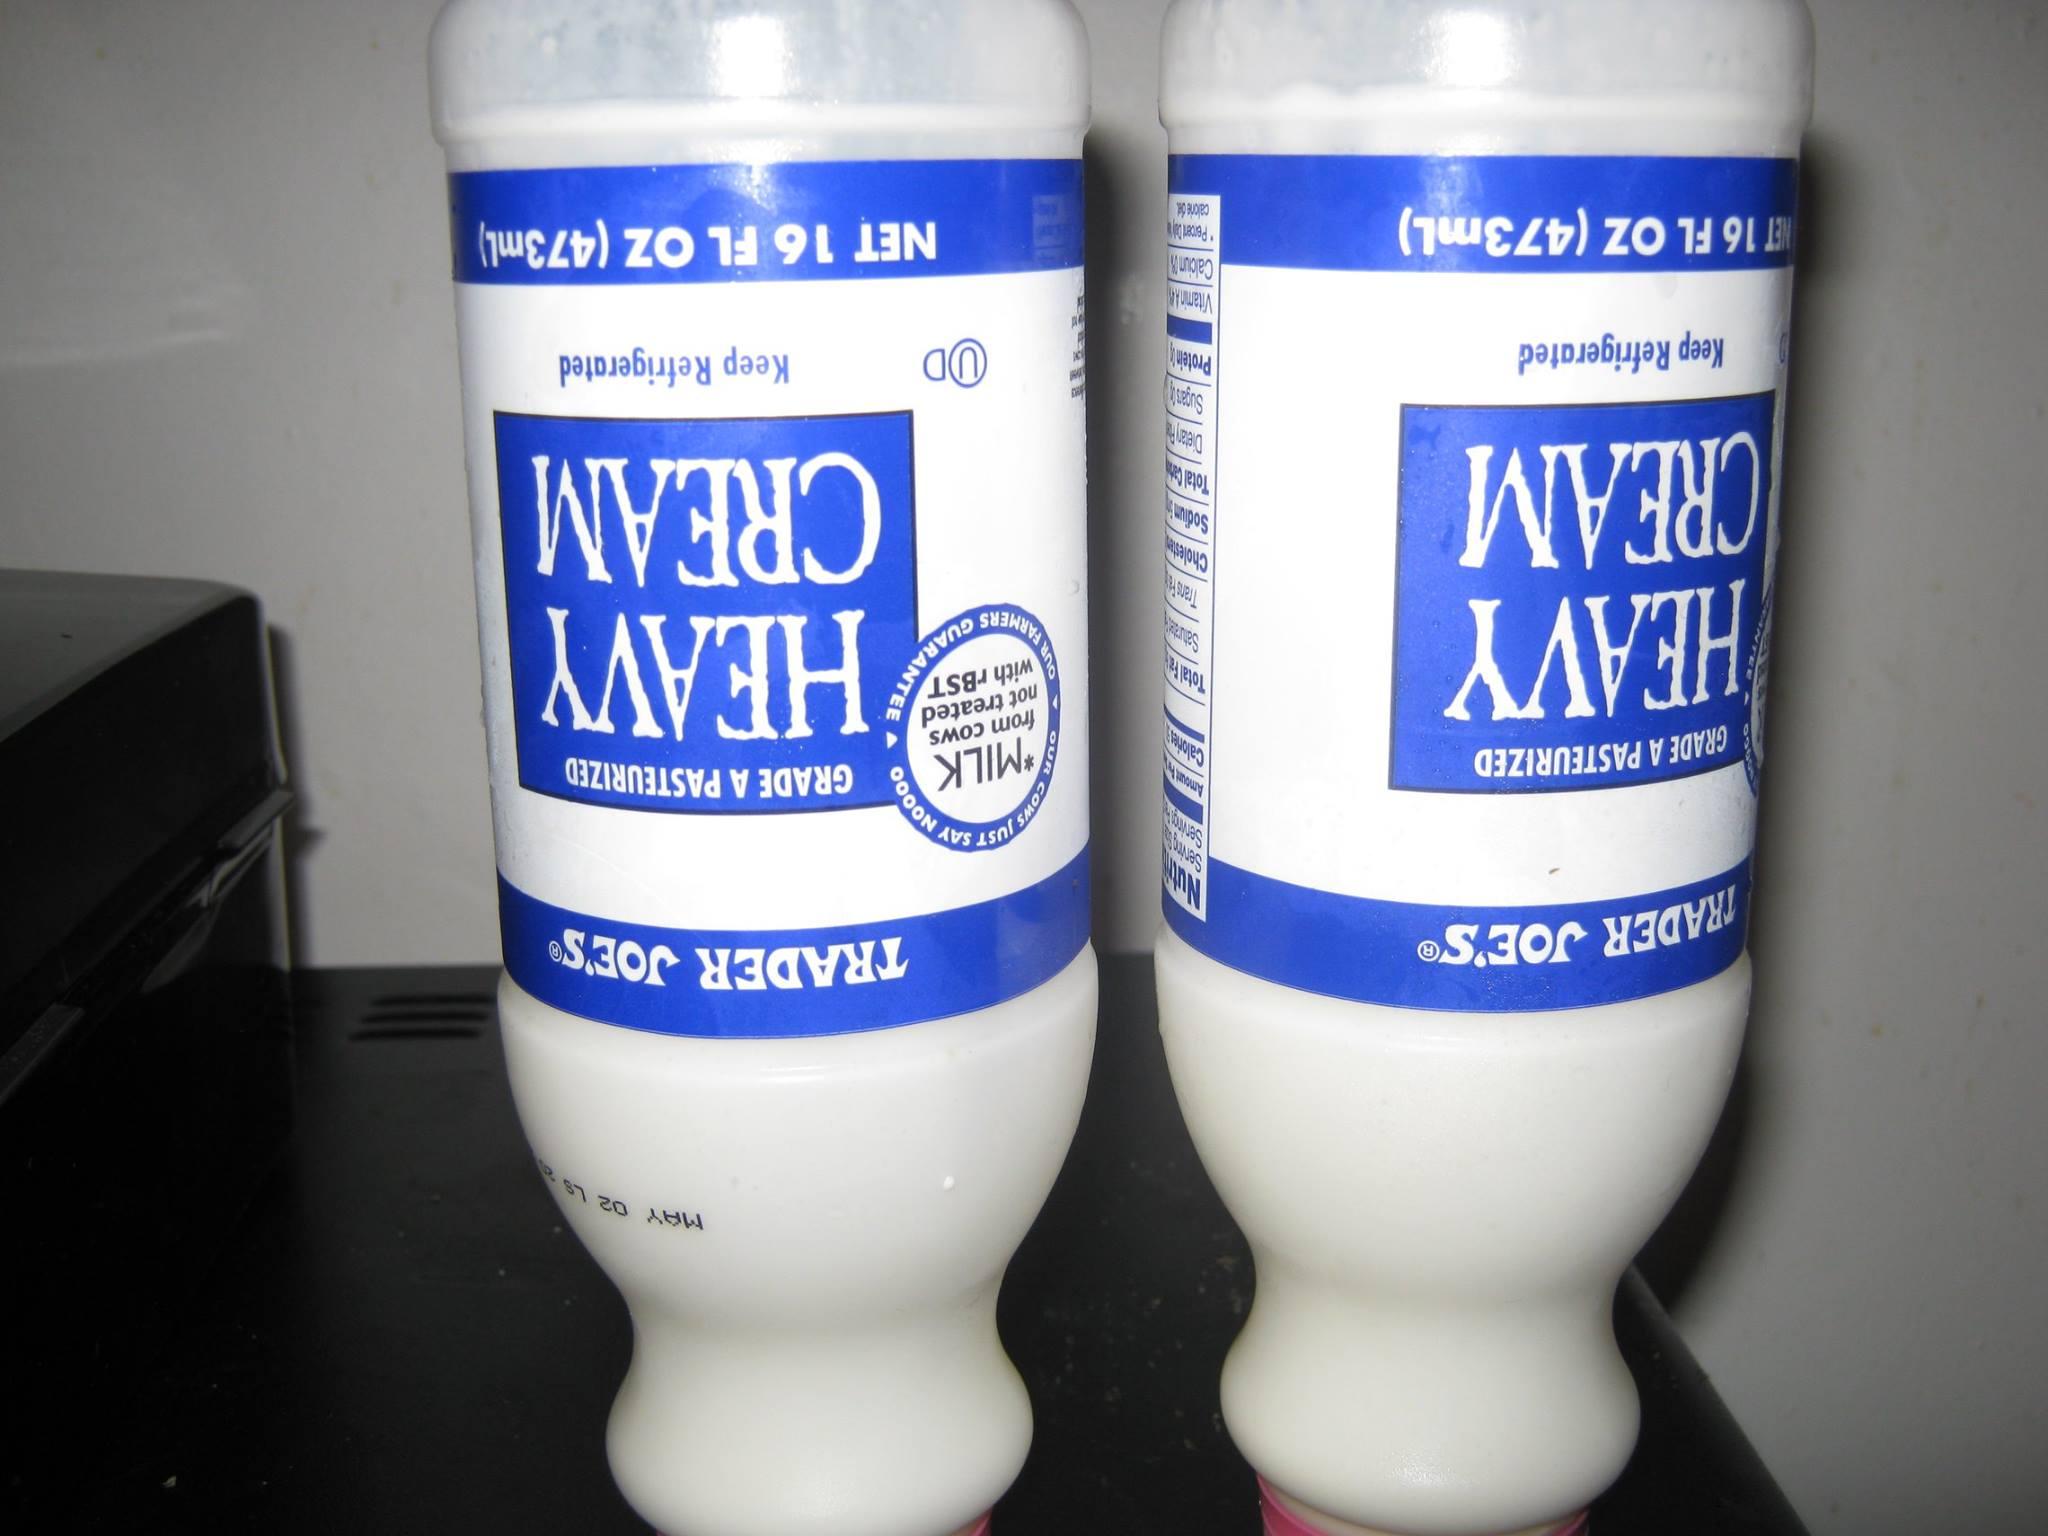 Two 16 oz bottles of heavy cream